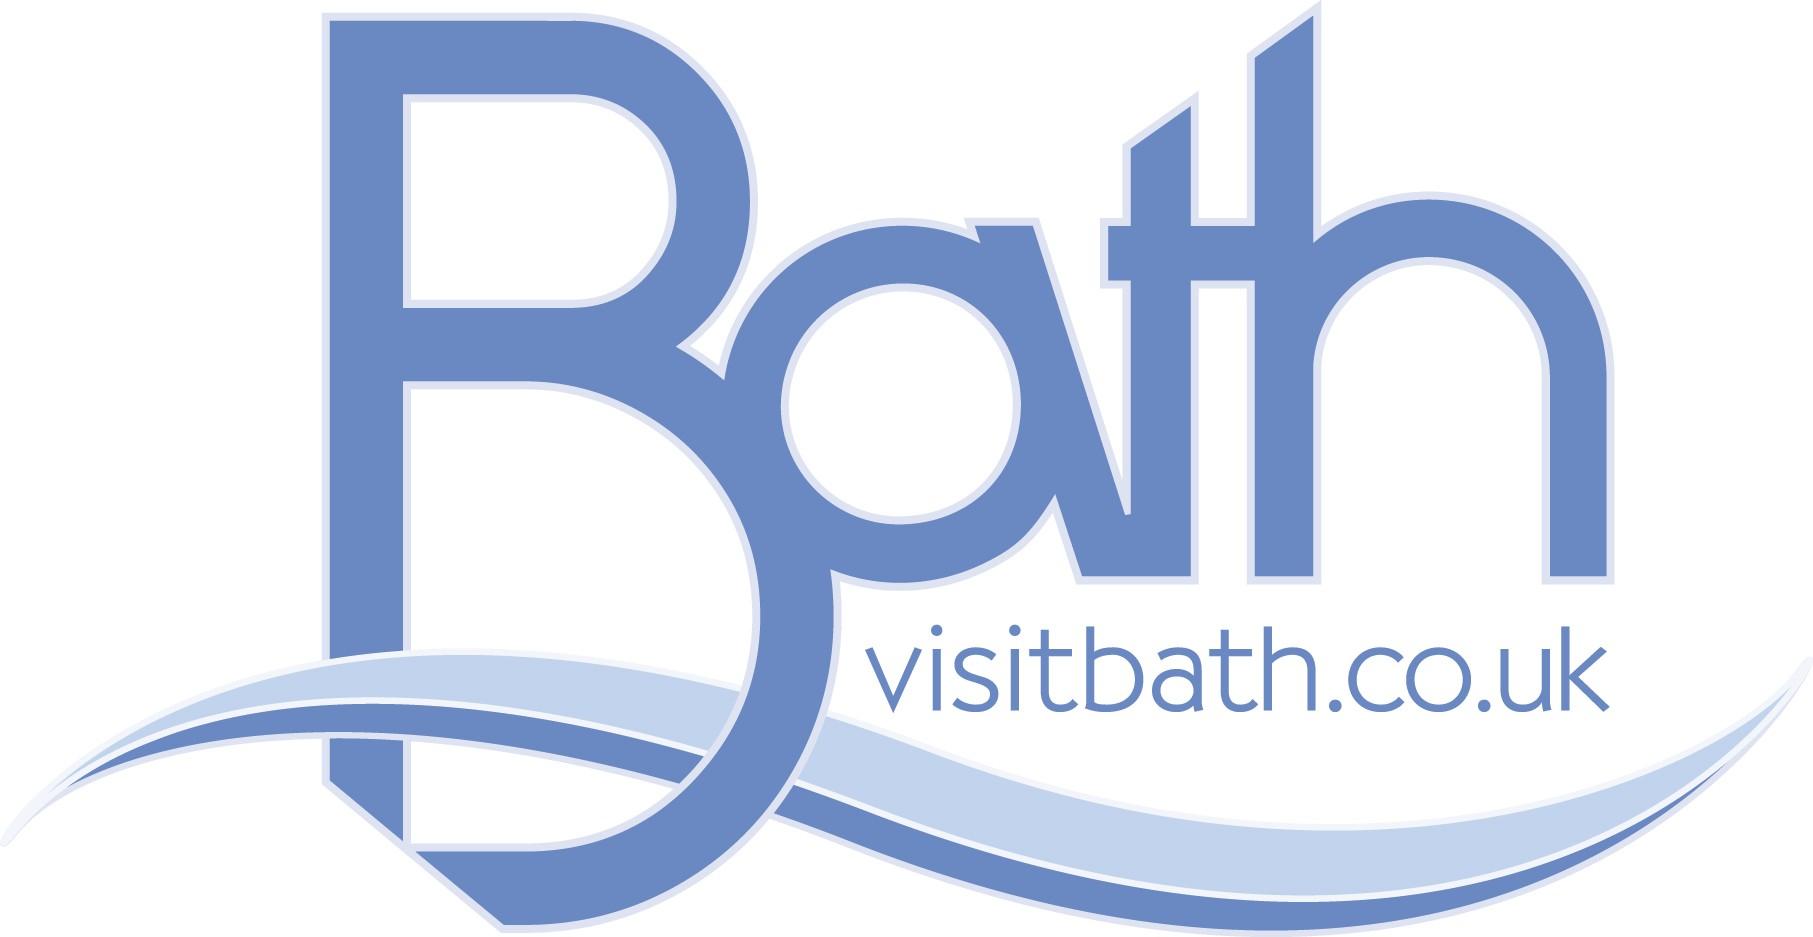 Bath Tourism